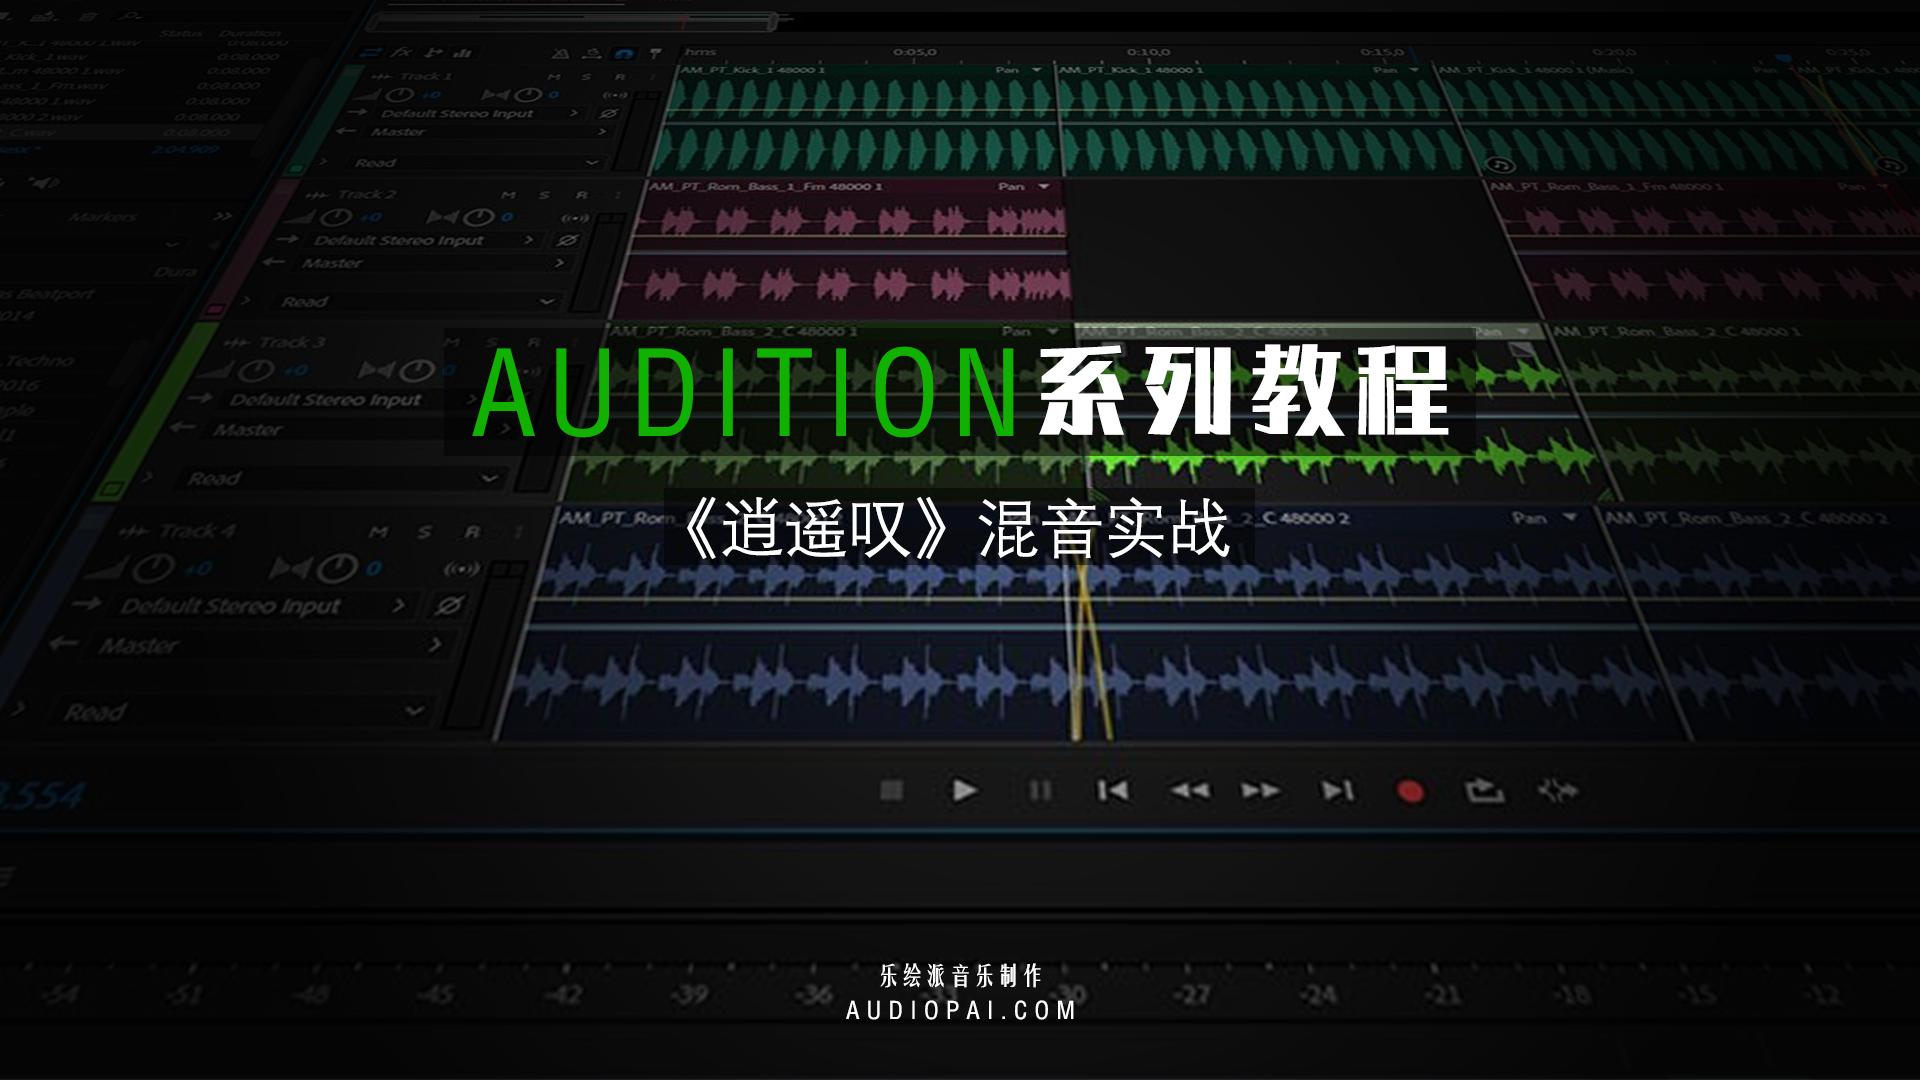 AUDITION音频后期混音教程 |《逍遥叹》翻唱 | 混音实战